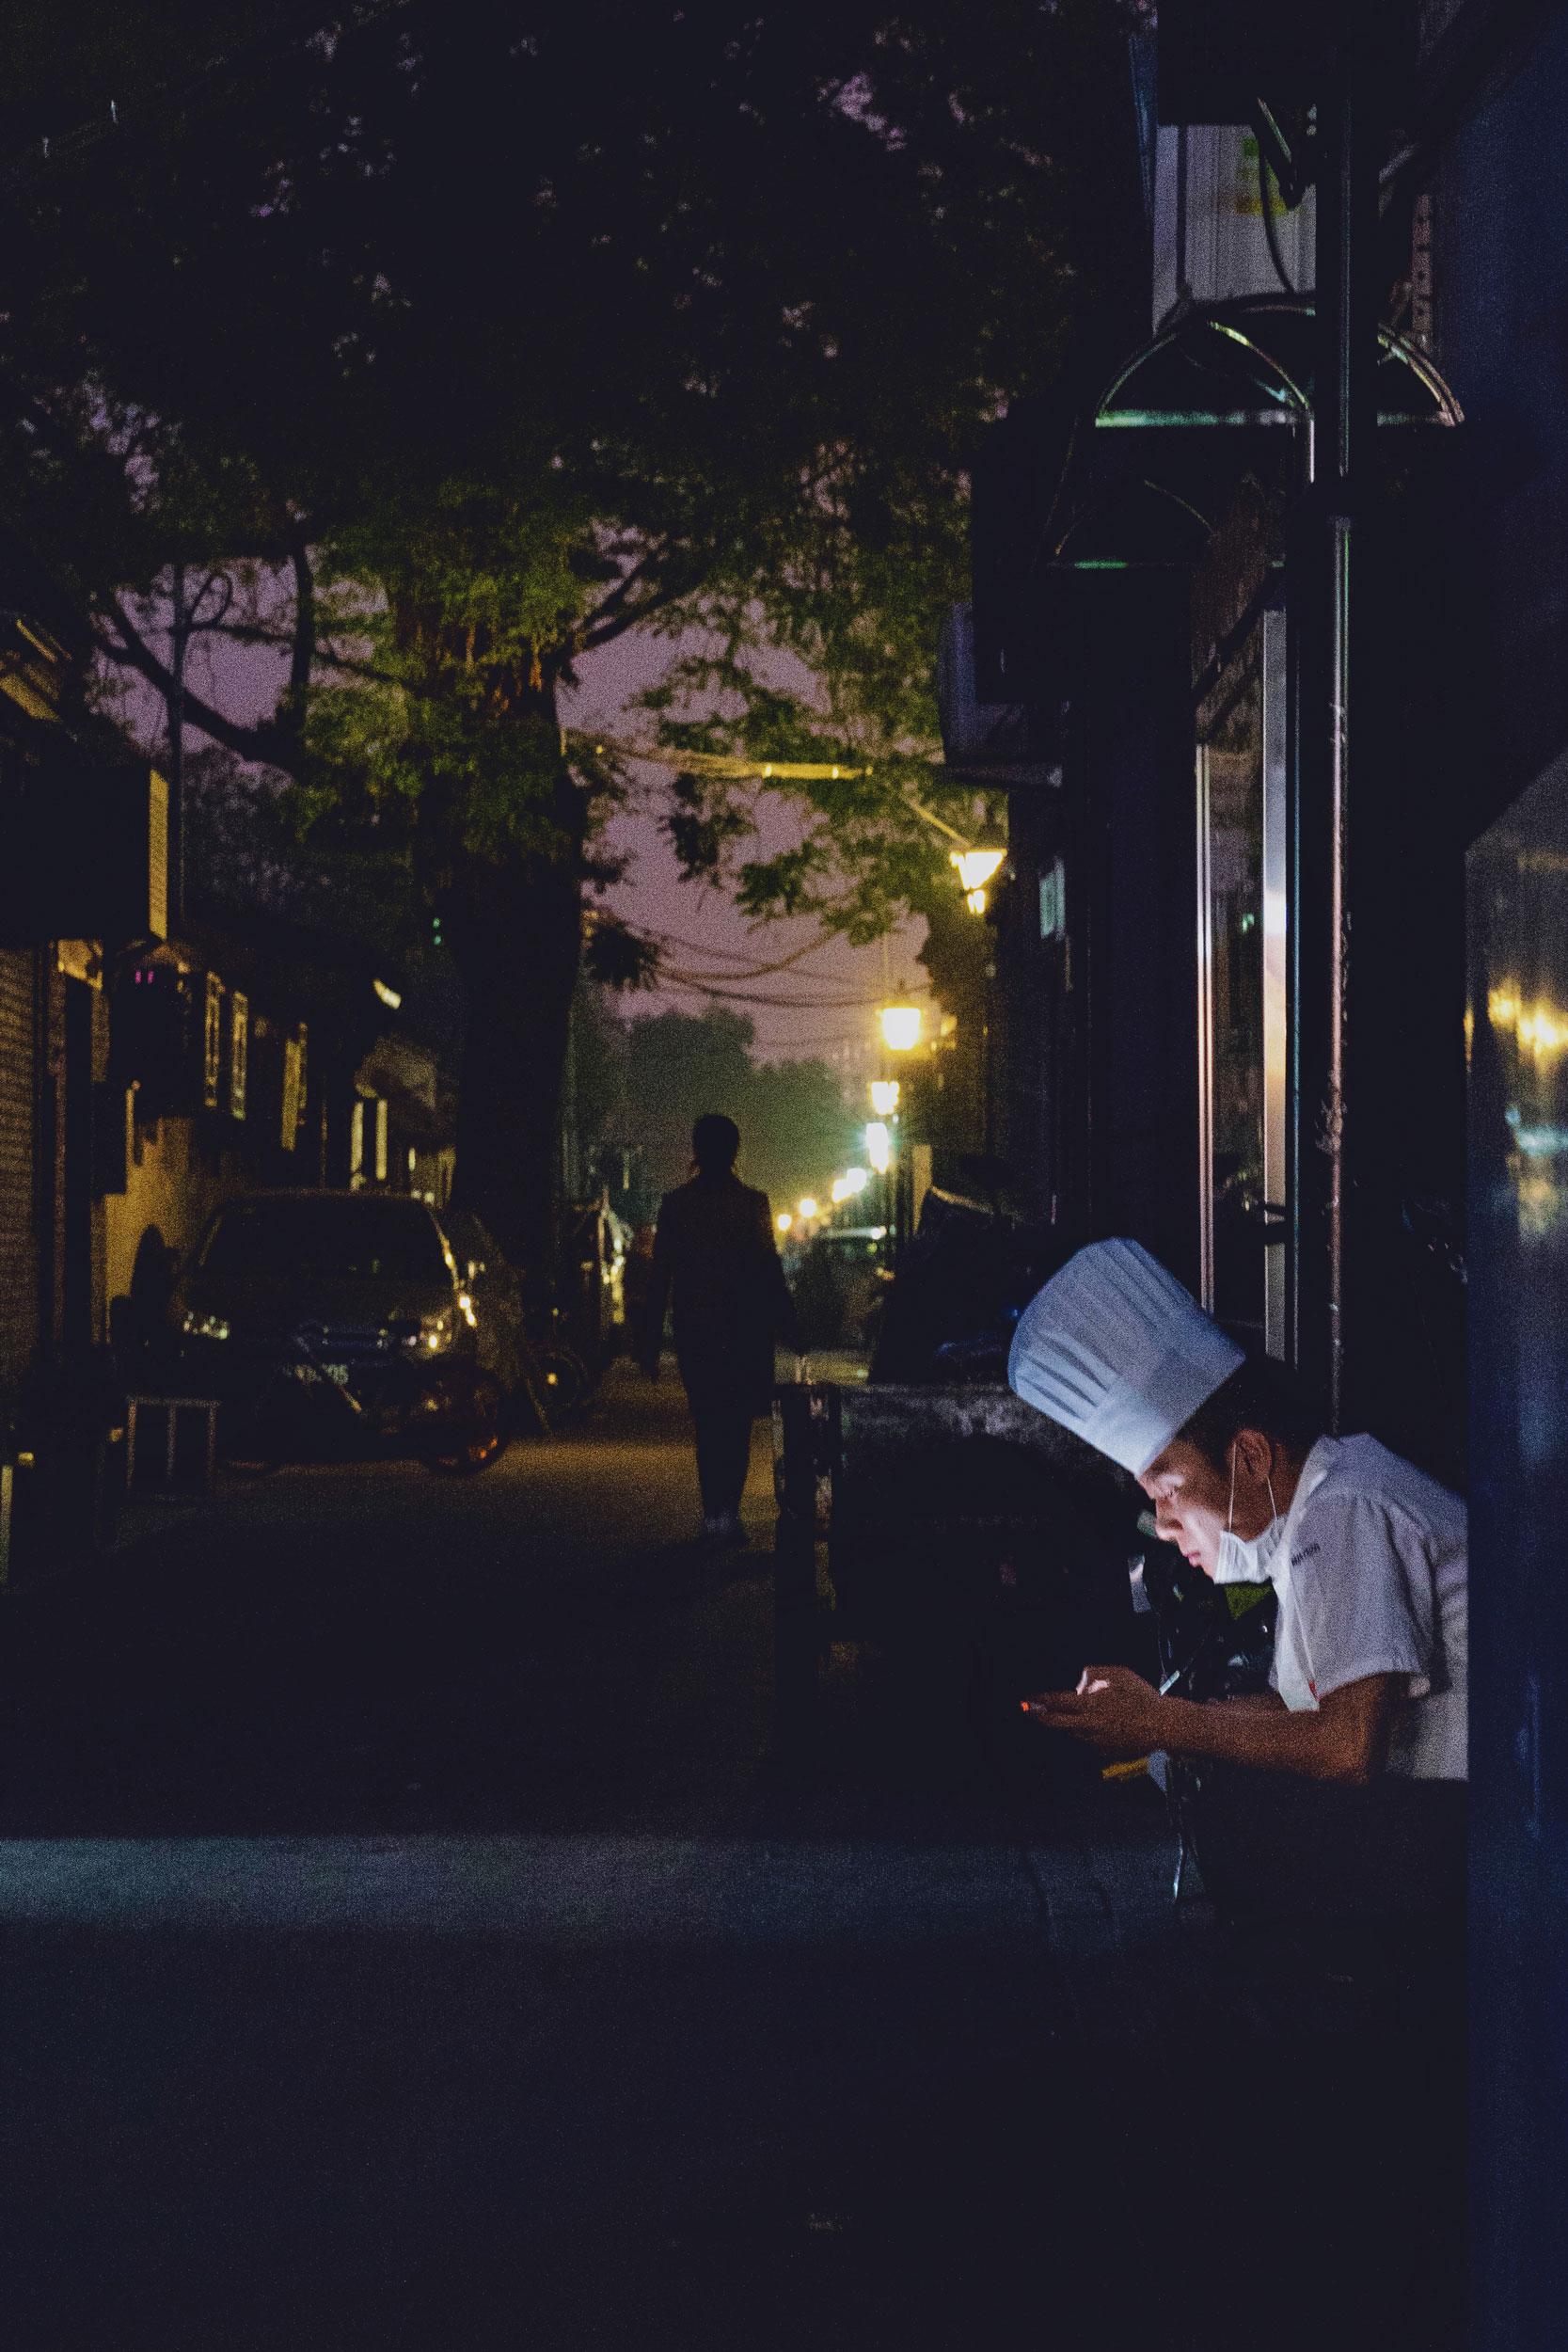 A worker goes on break at Luogu Lane.